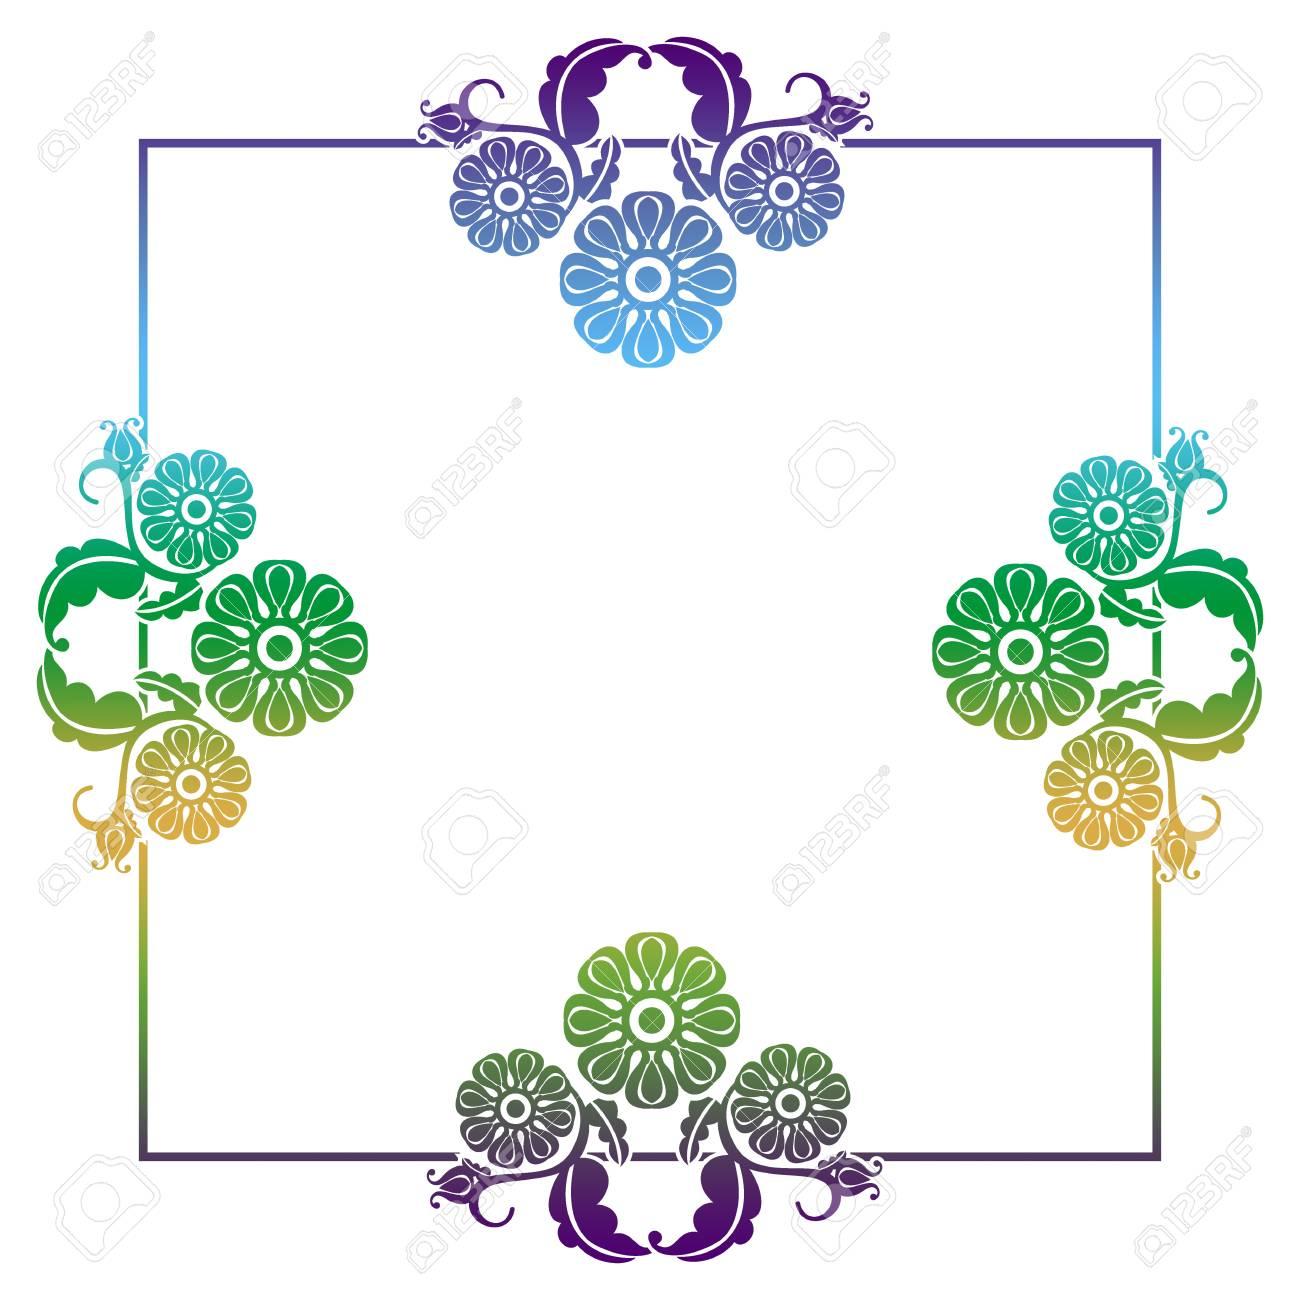 Gradient Quadratischen Rahmen Mit Blumen. Platz Kopieren ...